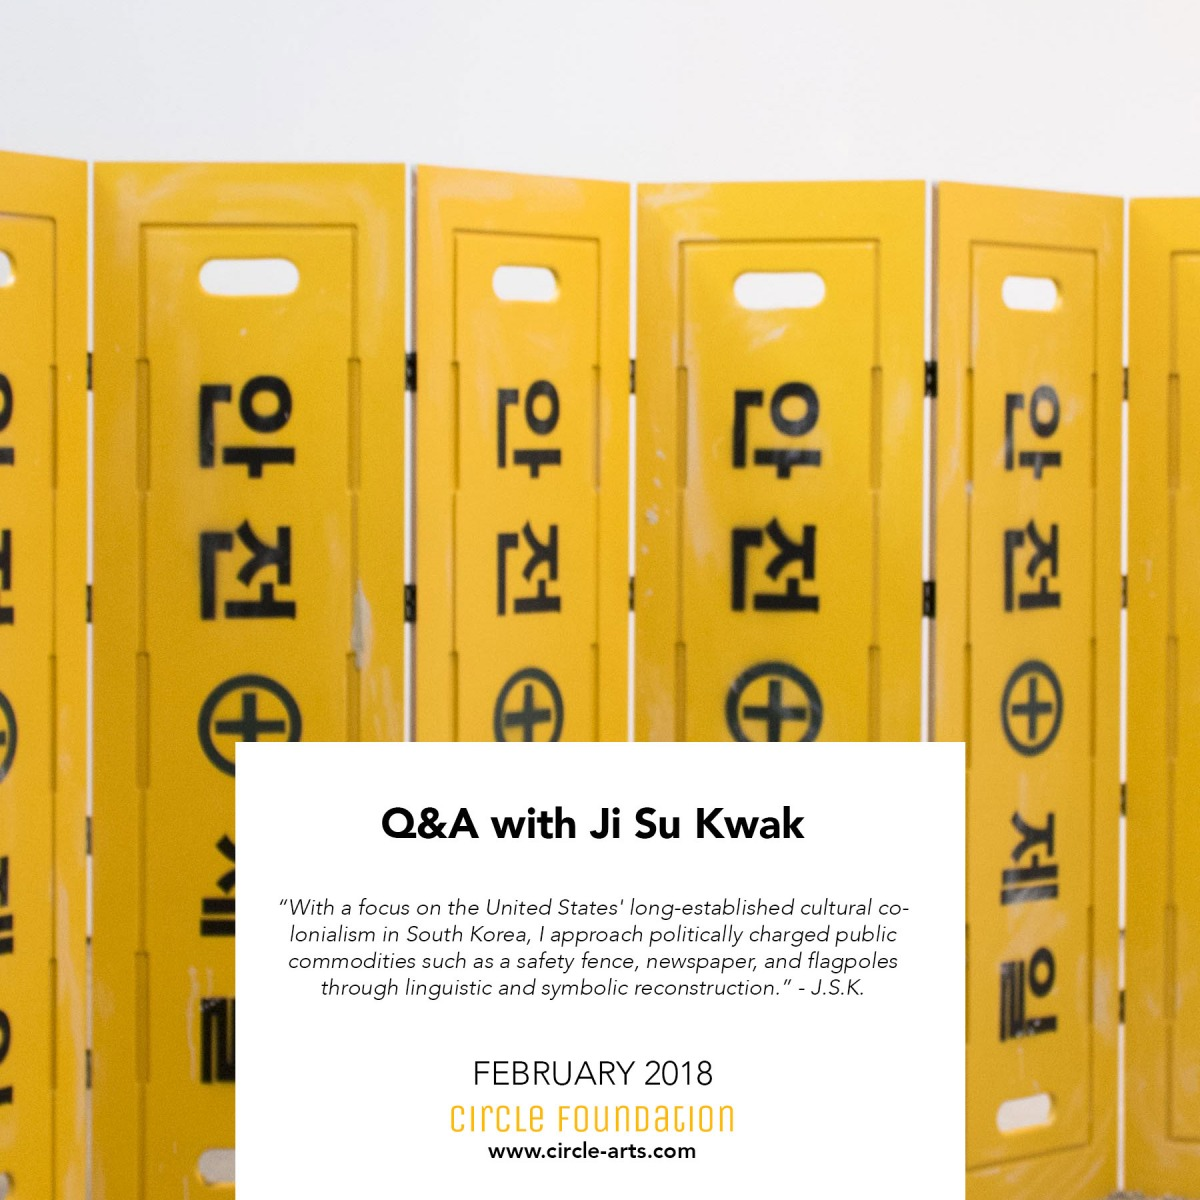 Q&A with Ji Su Kwak